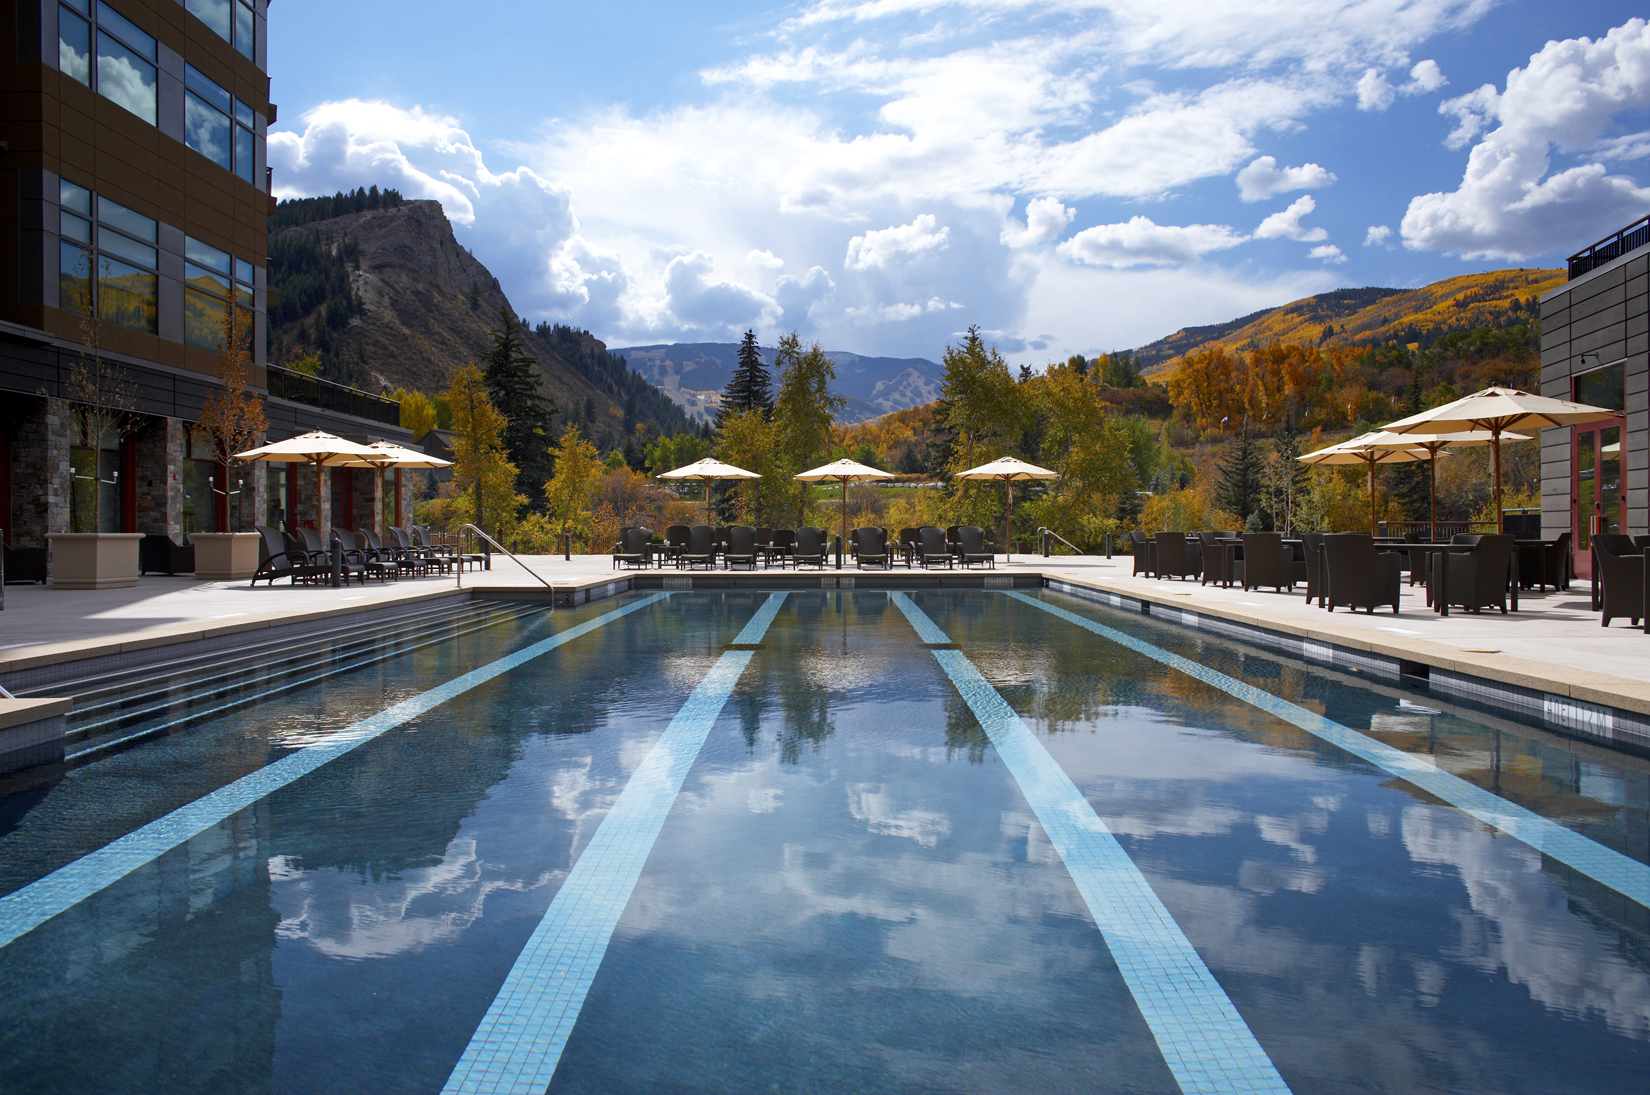 The Westin Riverfront Resort Spa